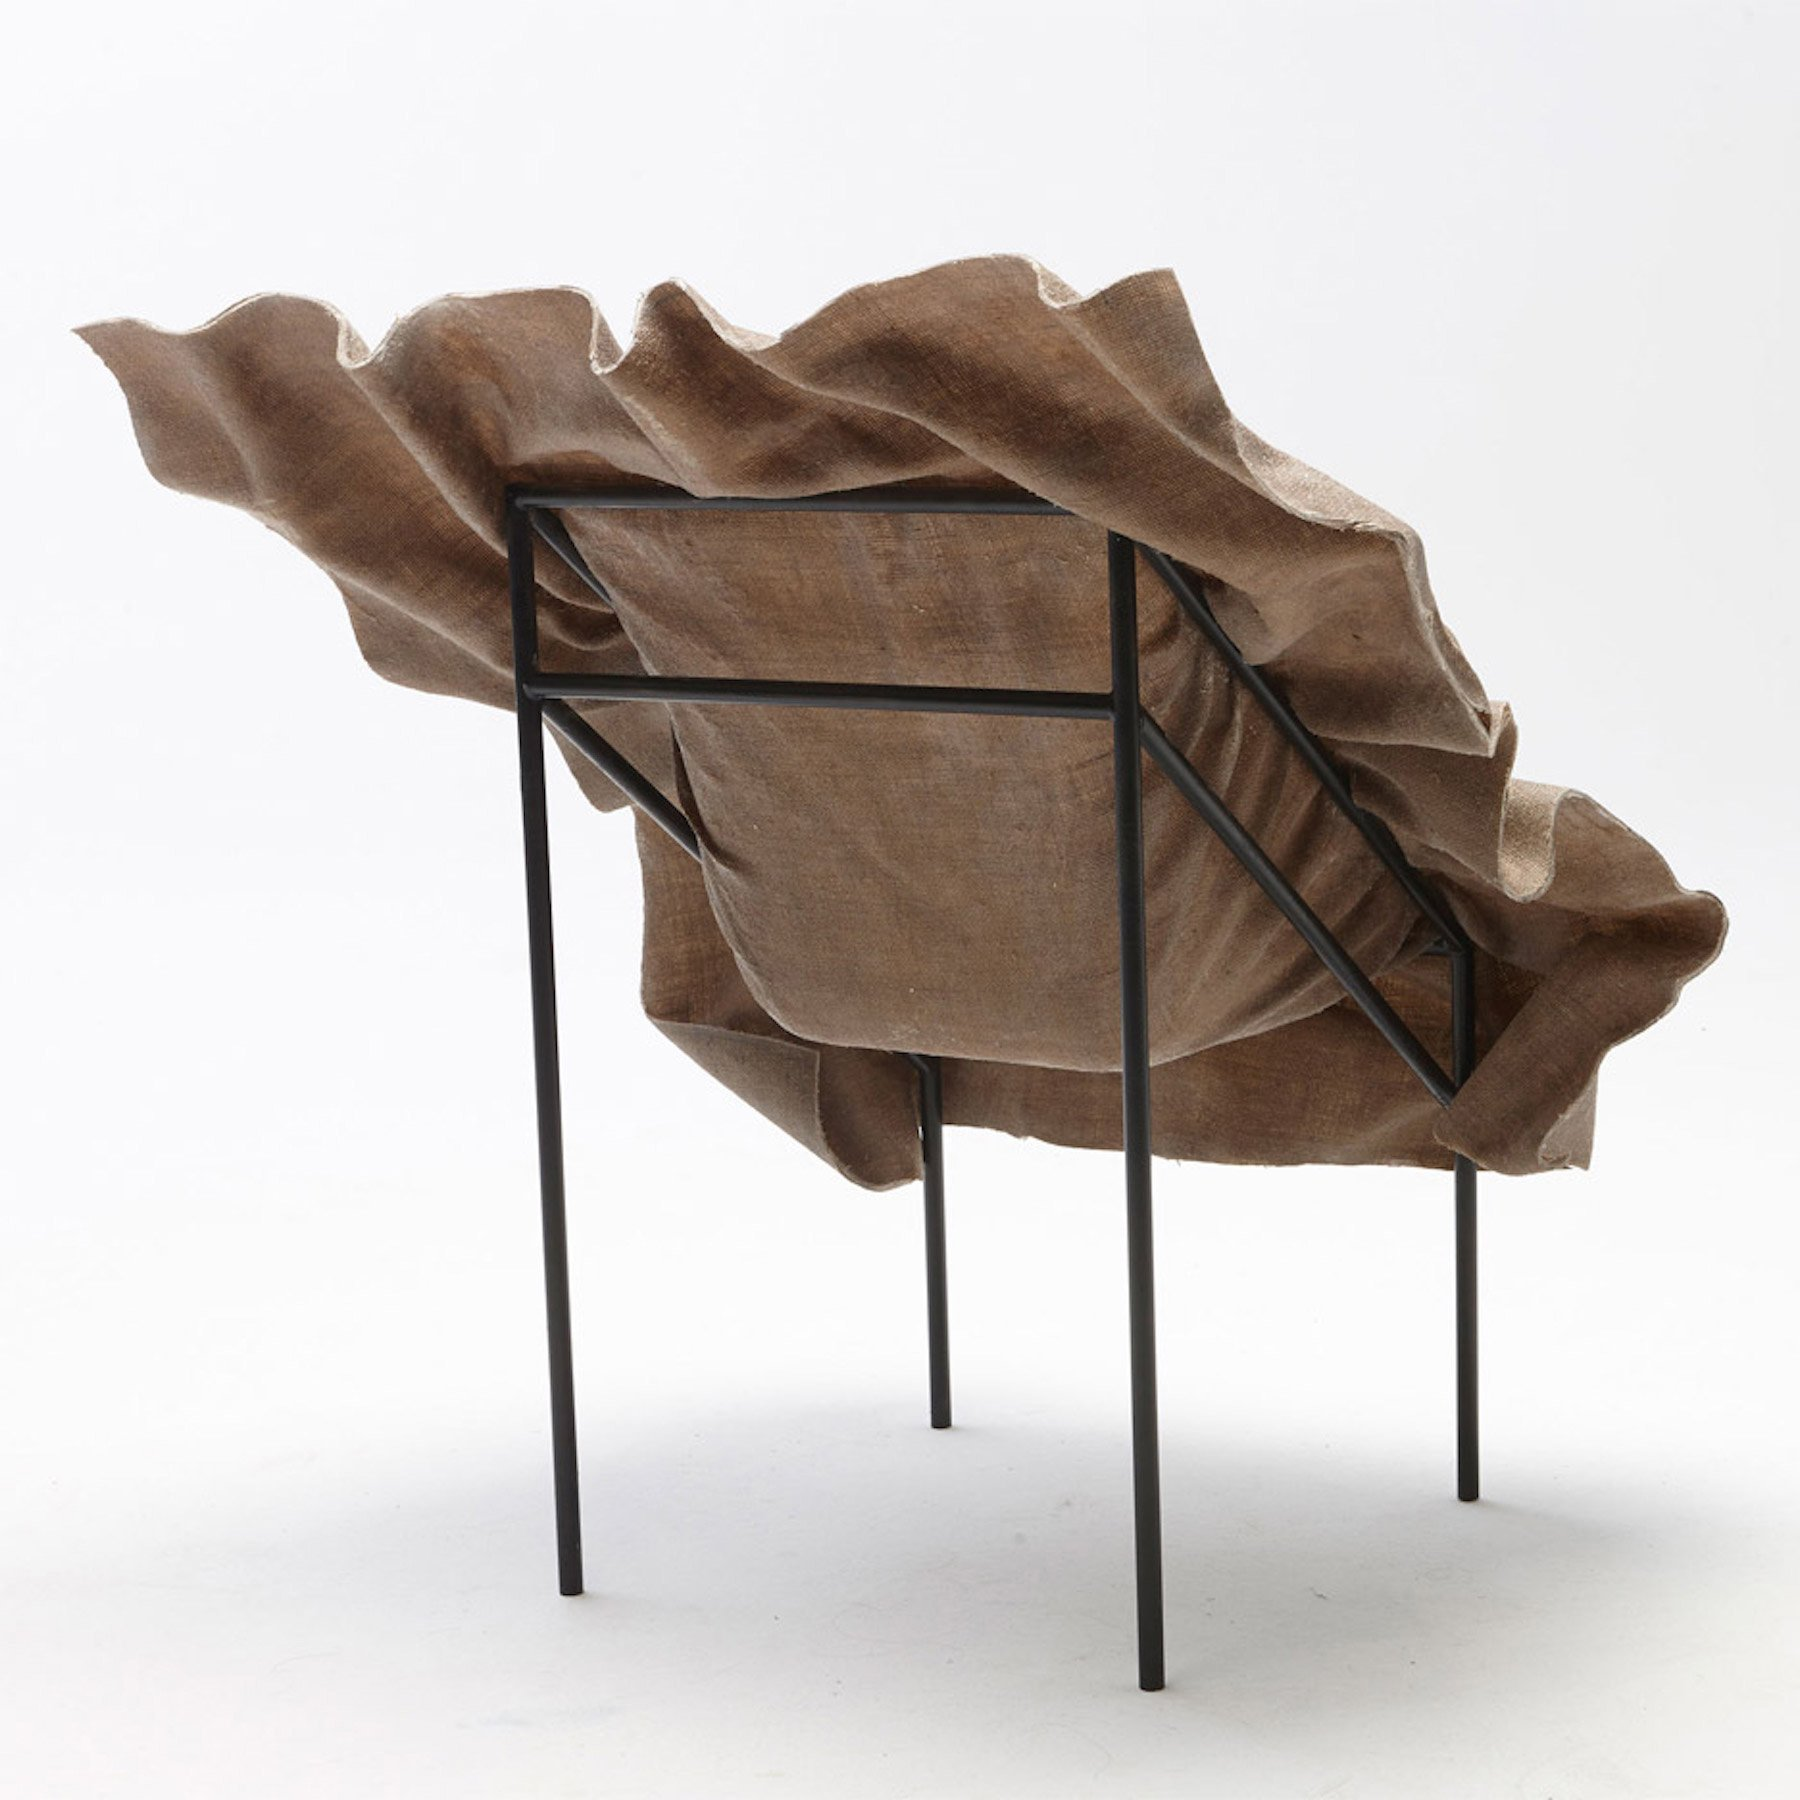 iGNANT-Design-Demeter-Fogarasi-Poetic-Furniture-Frozen-Textiles-06